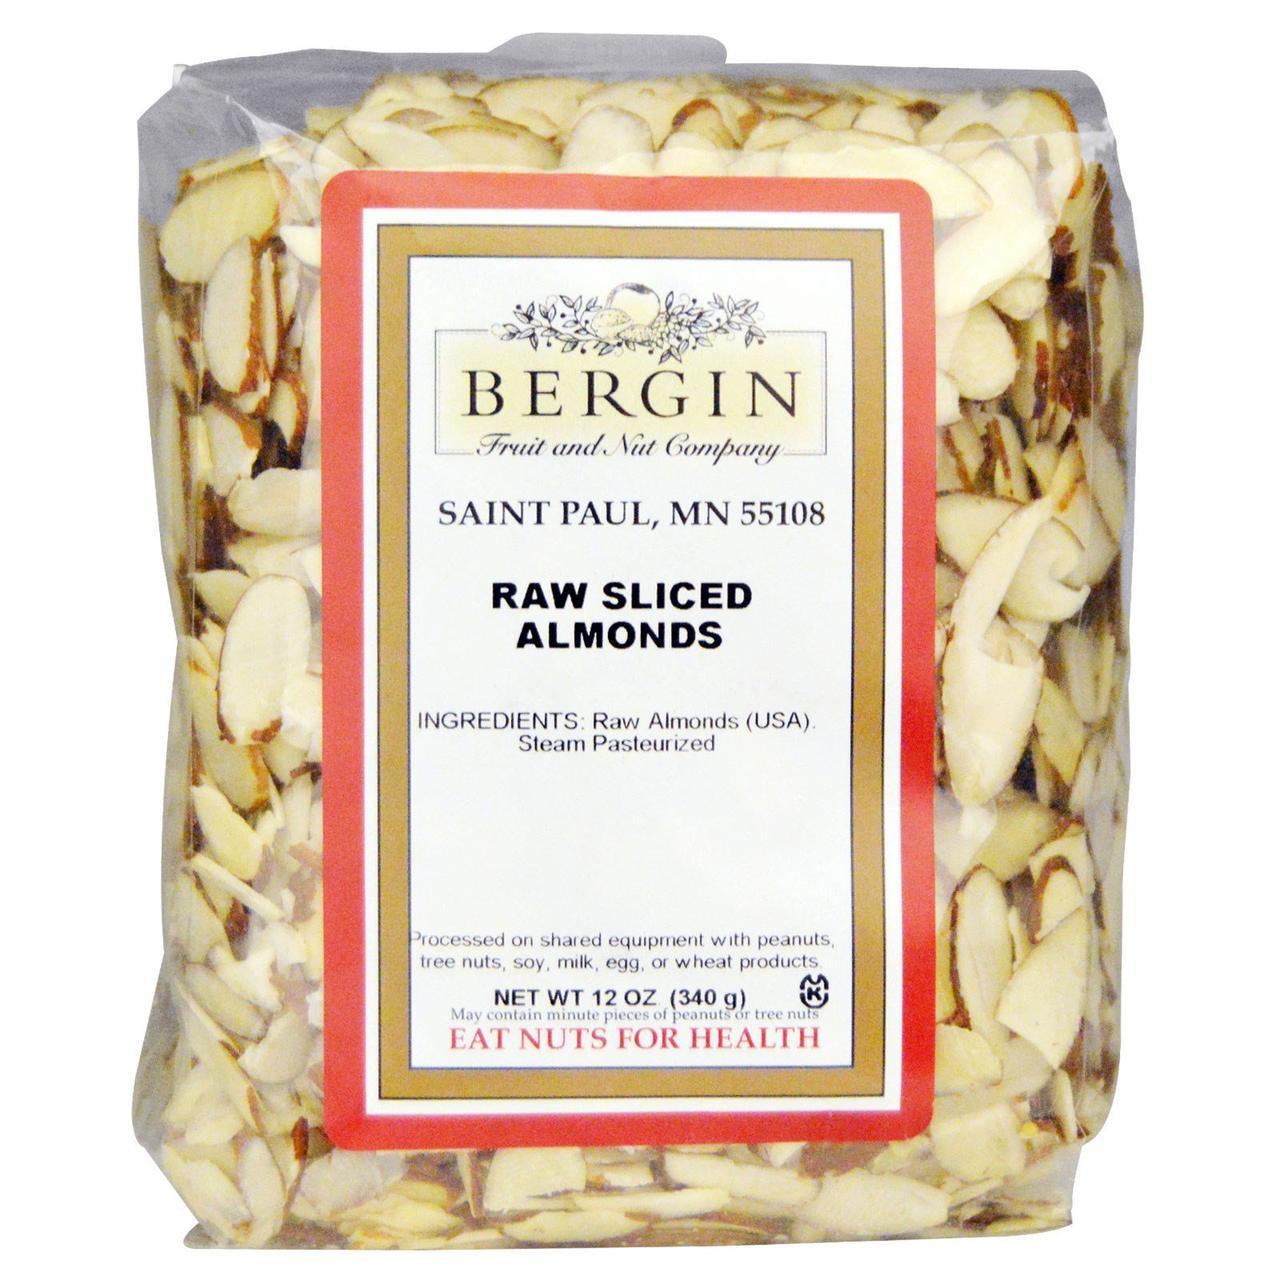 Ломтики сырого миндаля, Raw Sliced Almonds, Bergin Fruit and Nut Company, 340 г